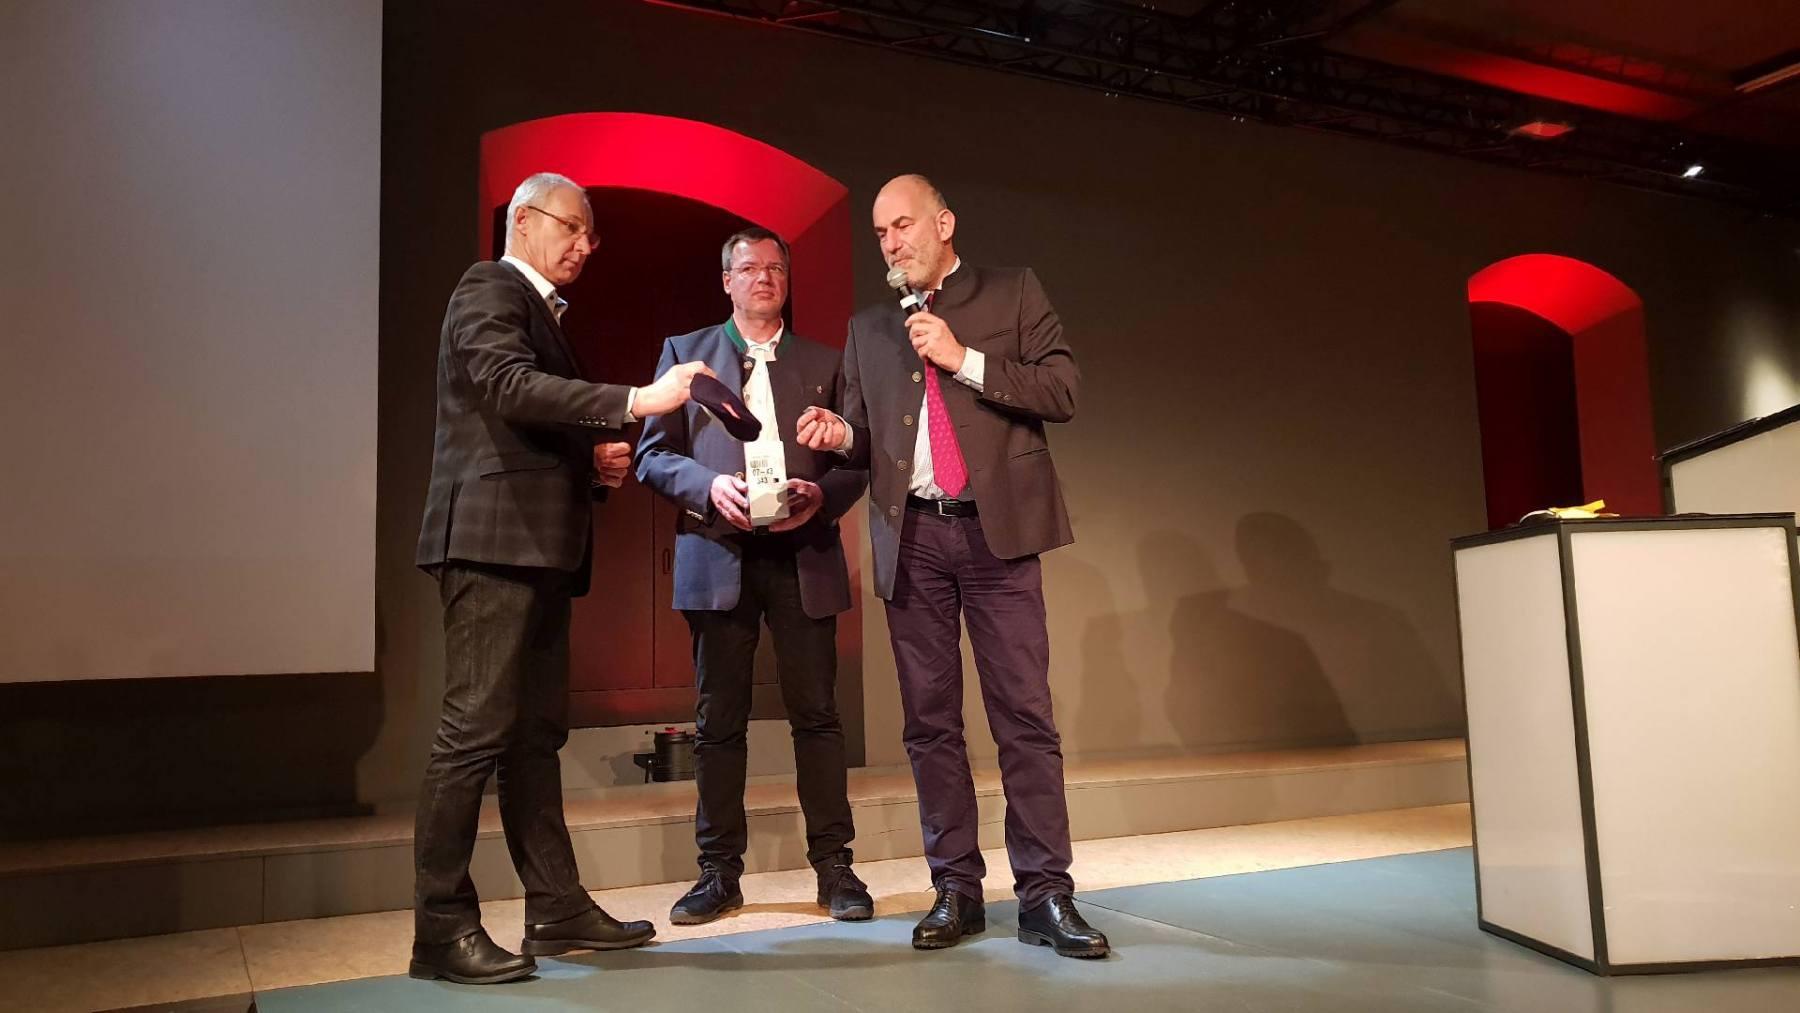 2018-12-07_Sprengseminar_Tirol_Nr_80